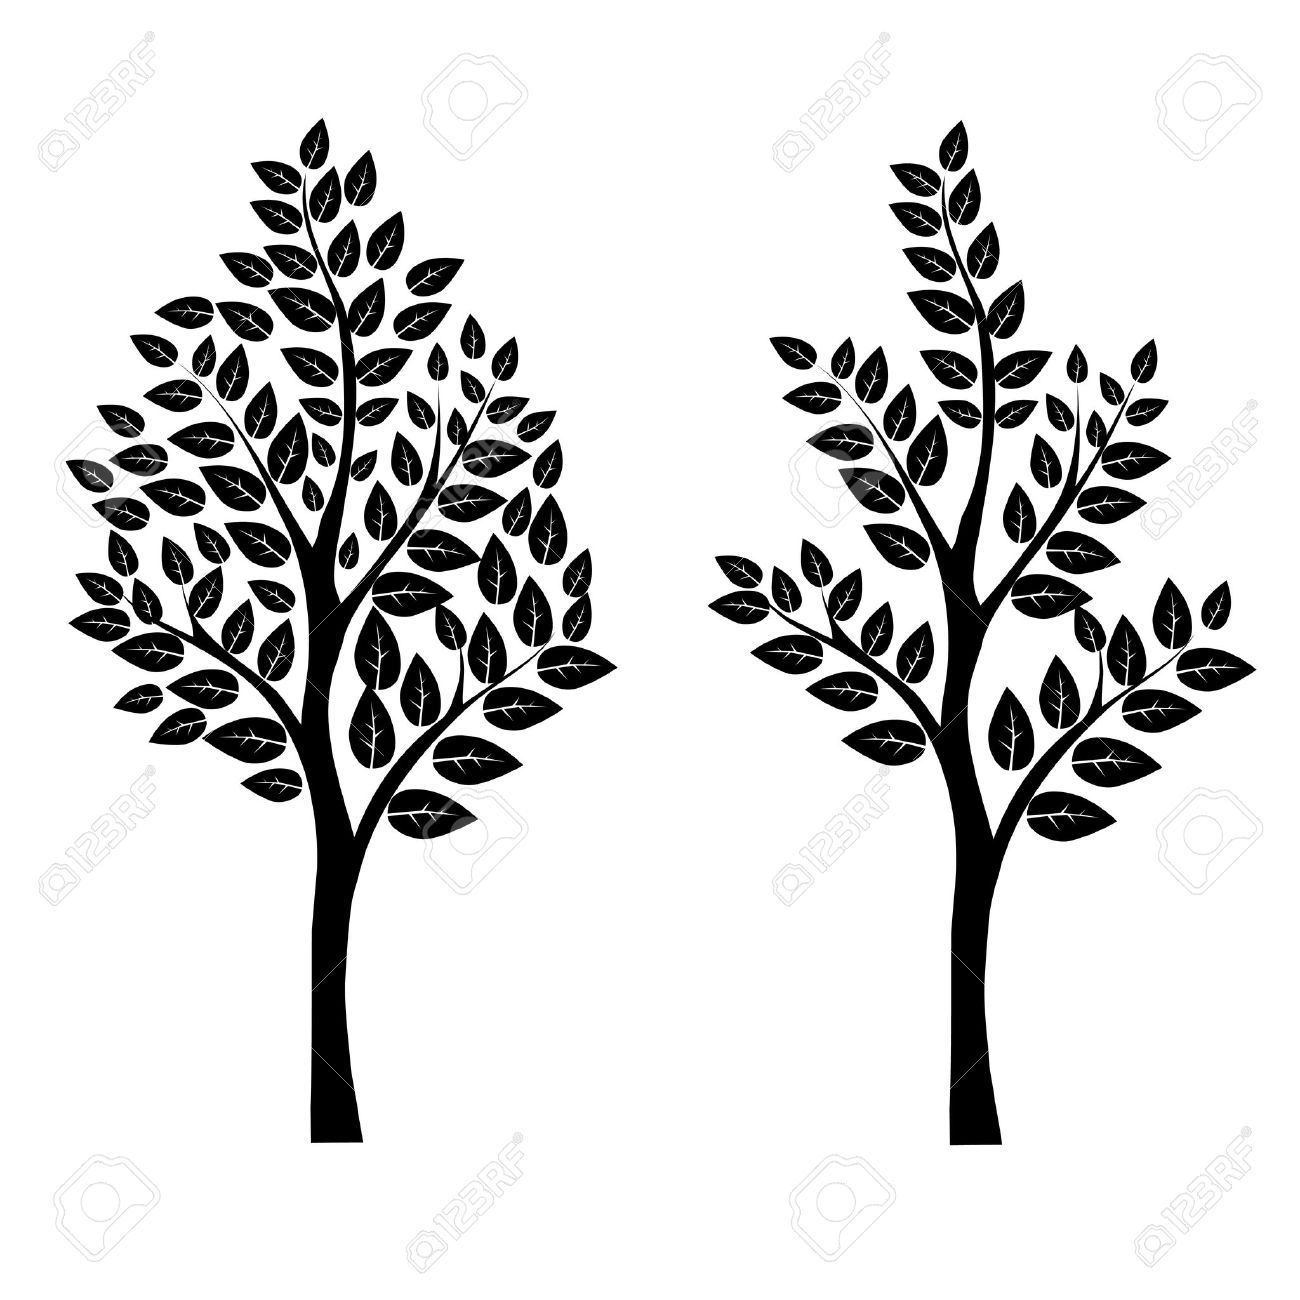 Black tree vector art eps 10.